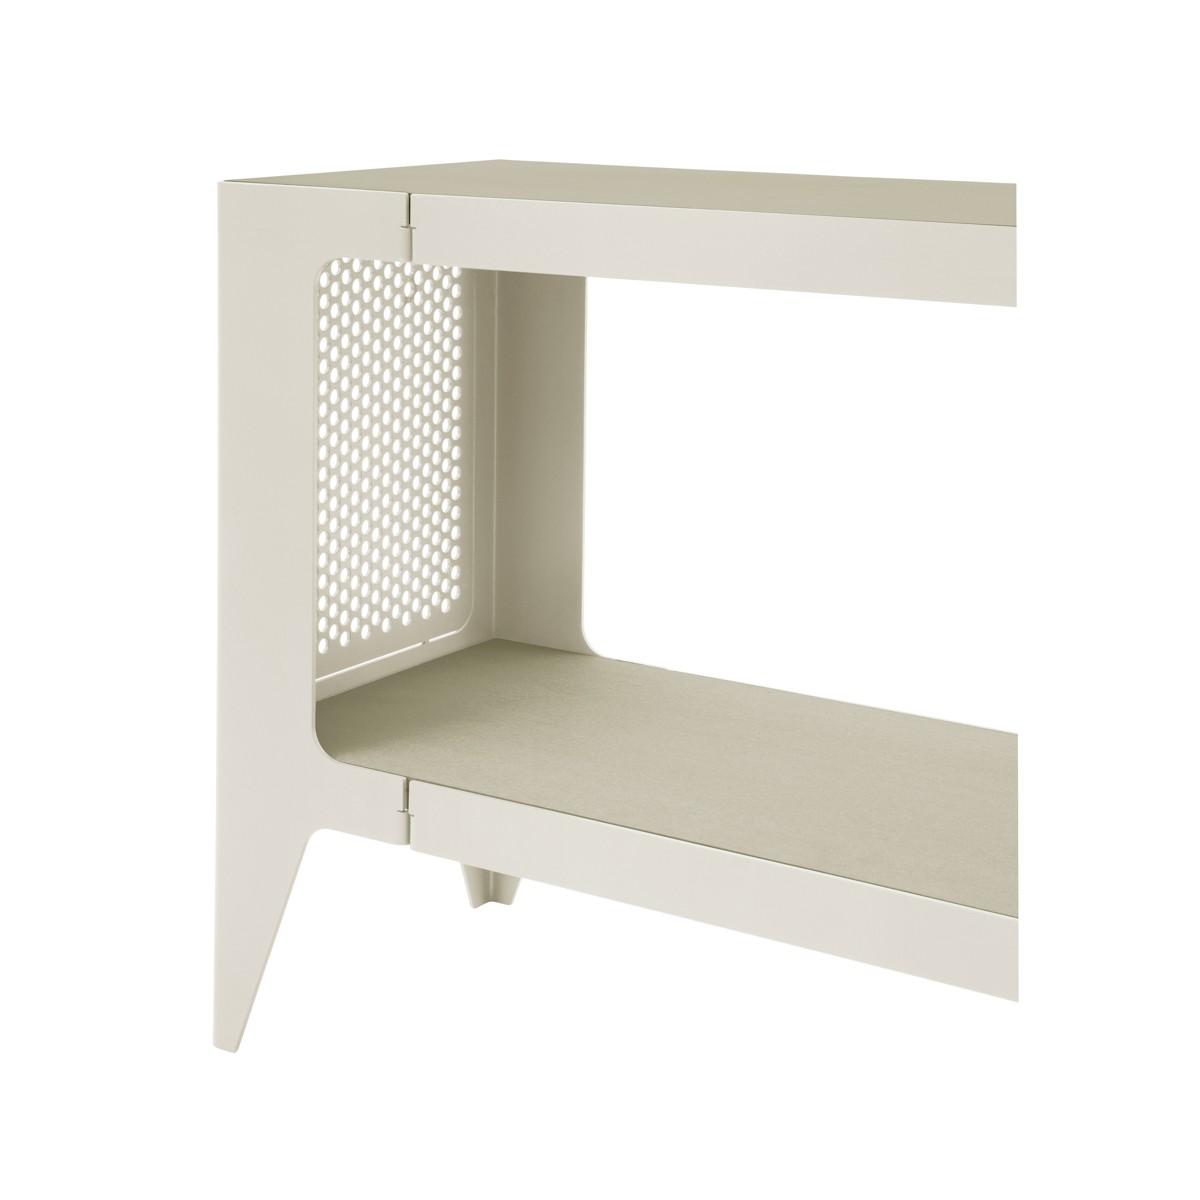 LOWBOARD |CHAMFER| nachhaltiges Möbeldesign | WYE